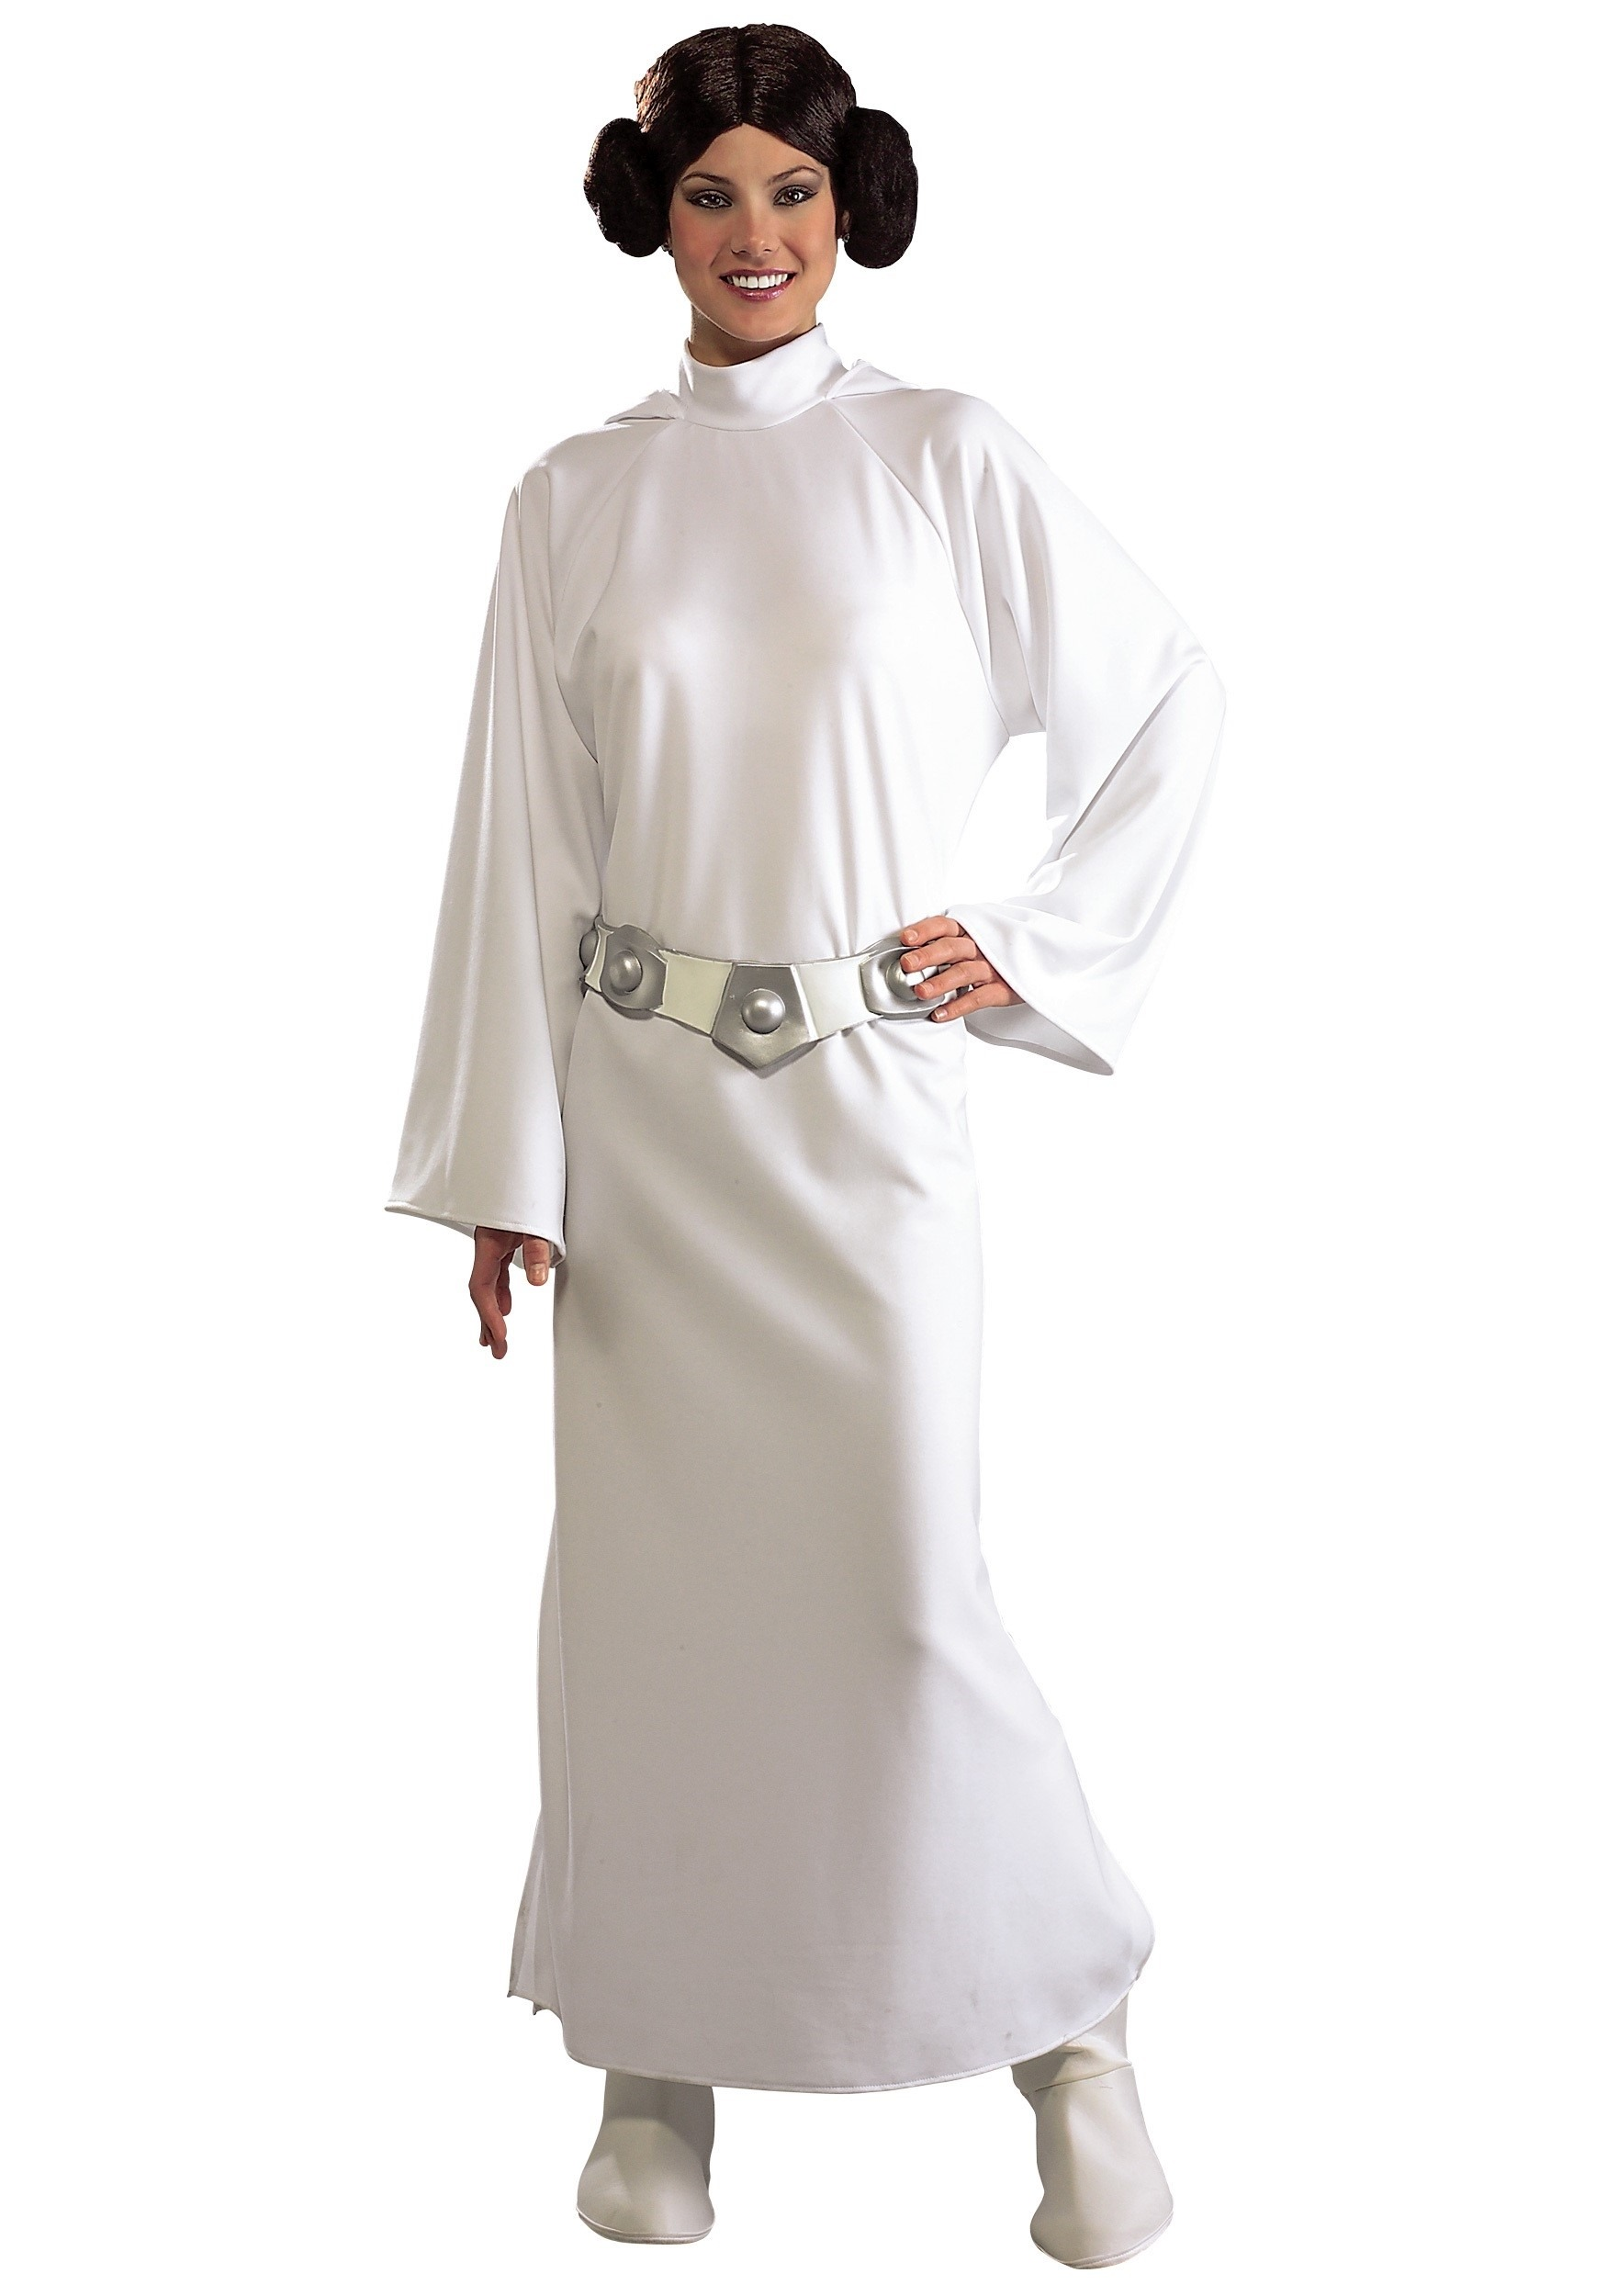 Women's Princess Leia Costume